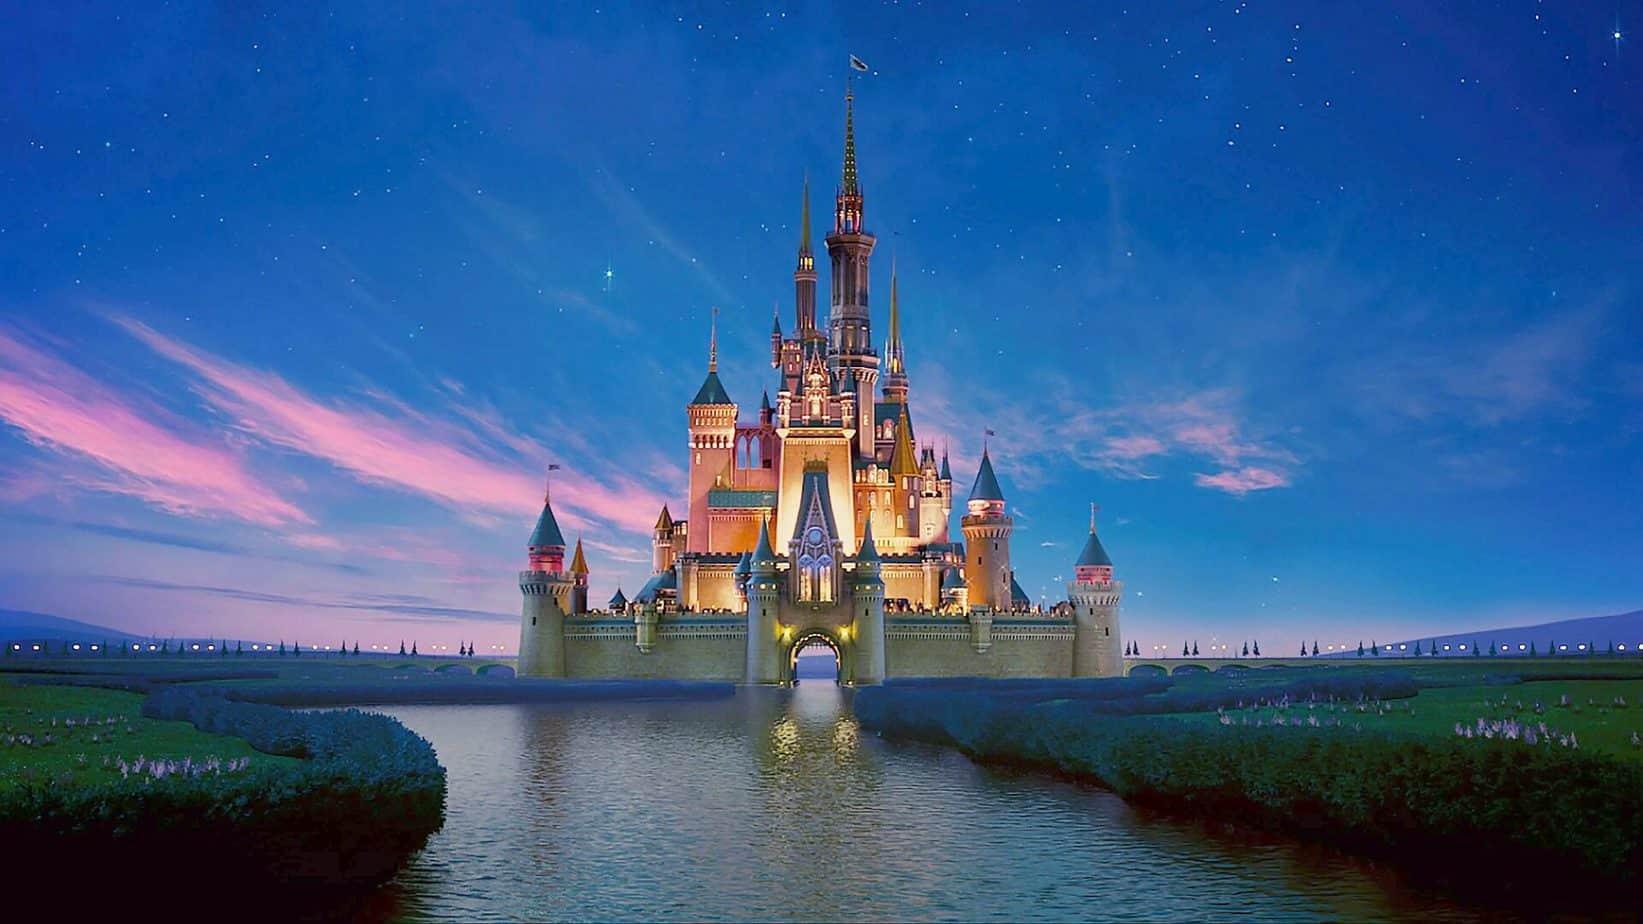 Florida man used Disney employee iPad to magically skip lines